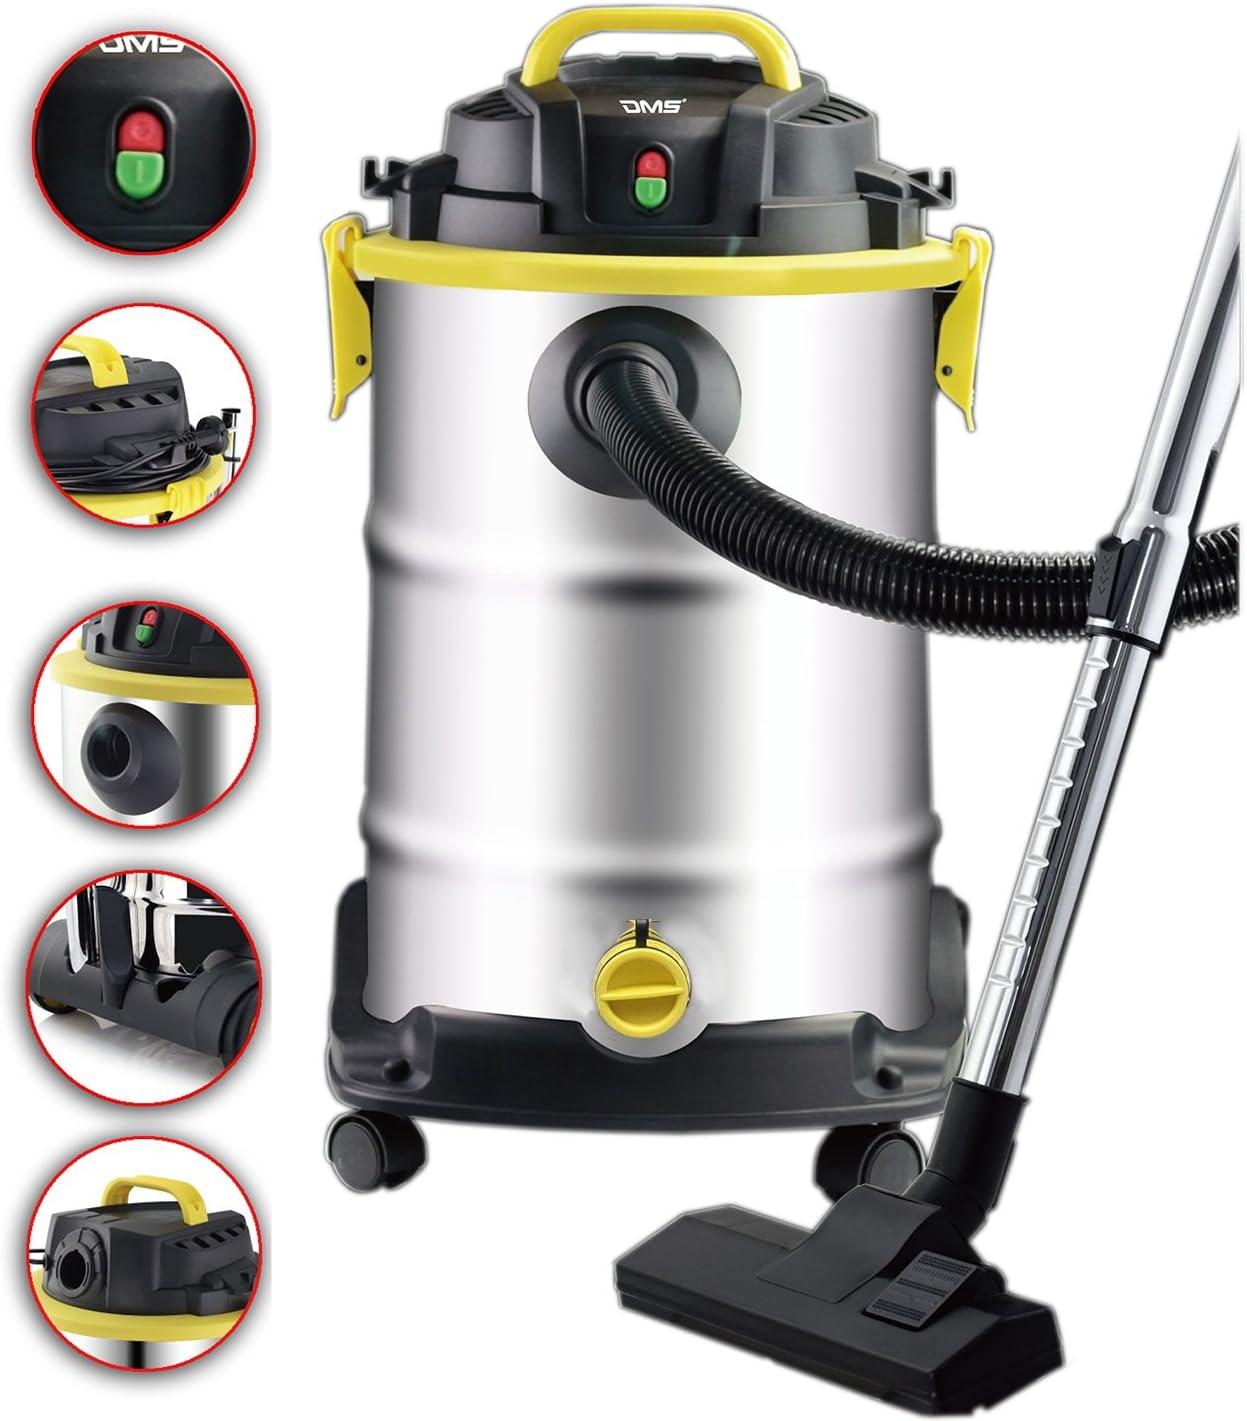 DMS® NTS 20 Aspiradora Aspiradora en seco húmedo aspirador industrial multiusos 20 litros Max. 1800 W con 3 M manguera: Amazon.es: Hogar